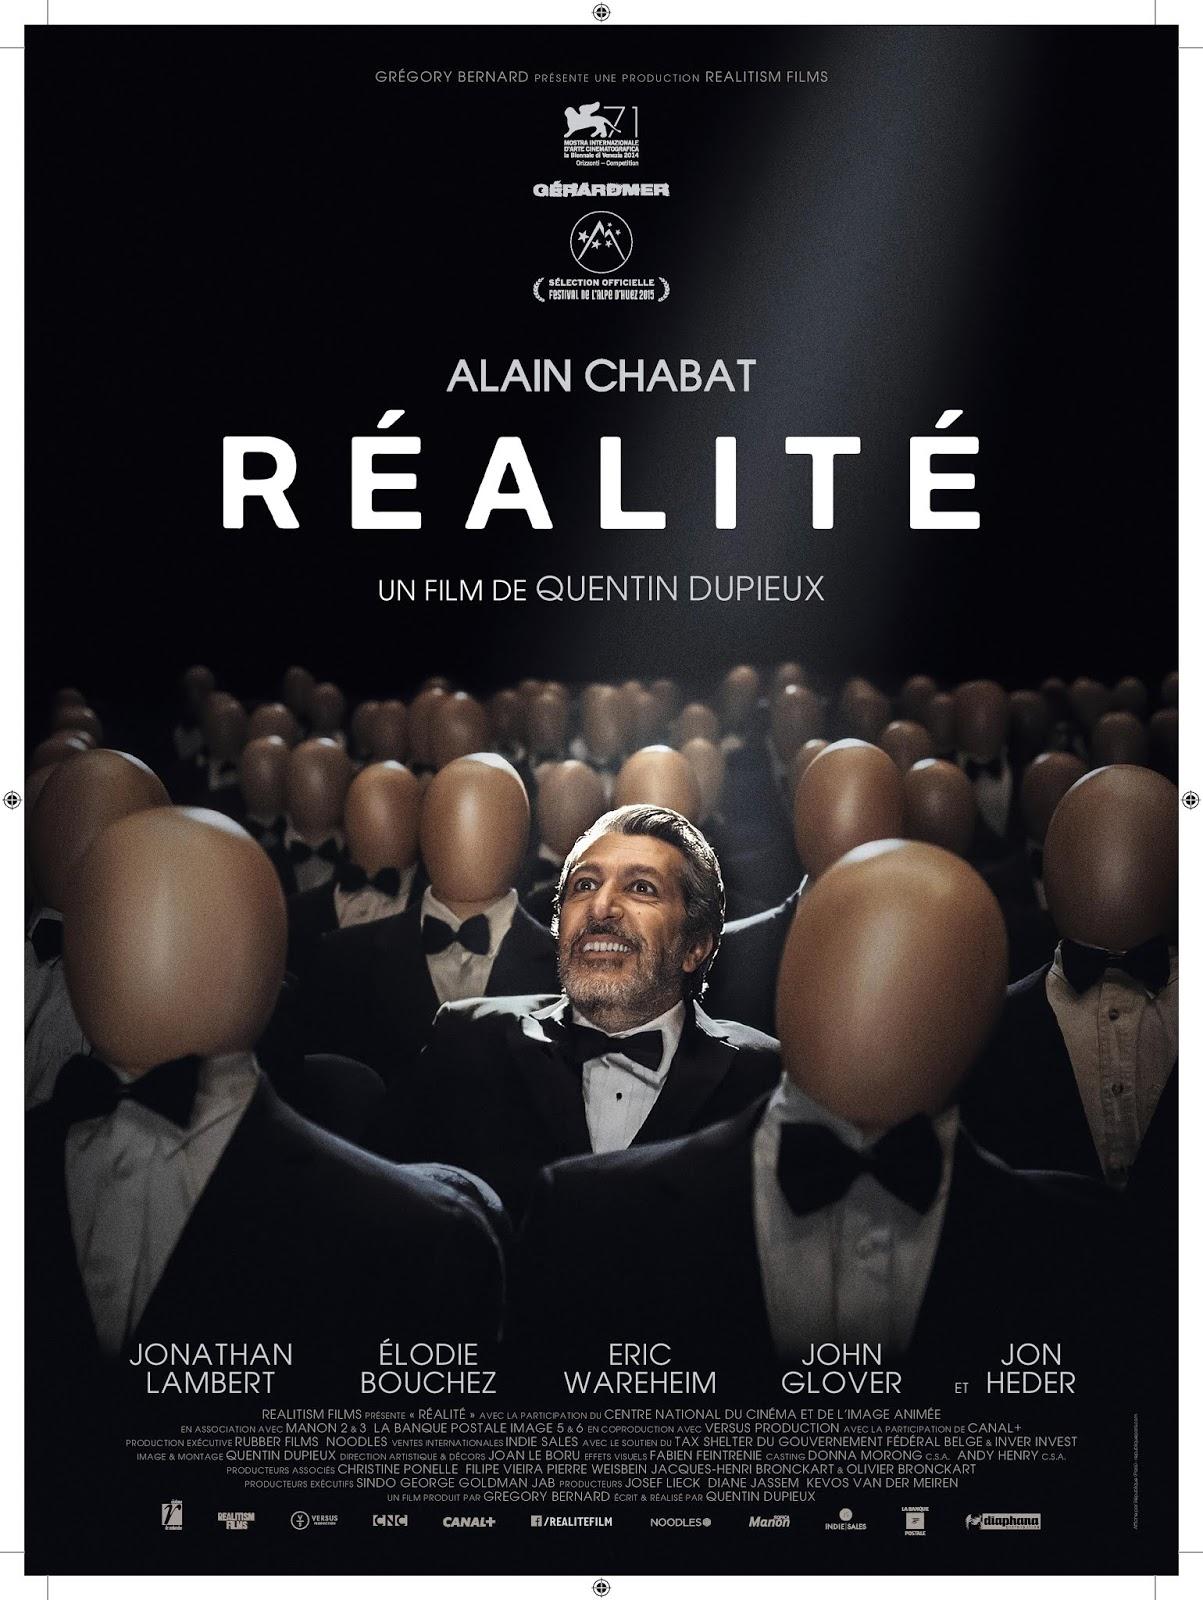 Reality-Alain Chabat